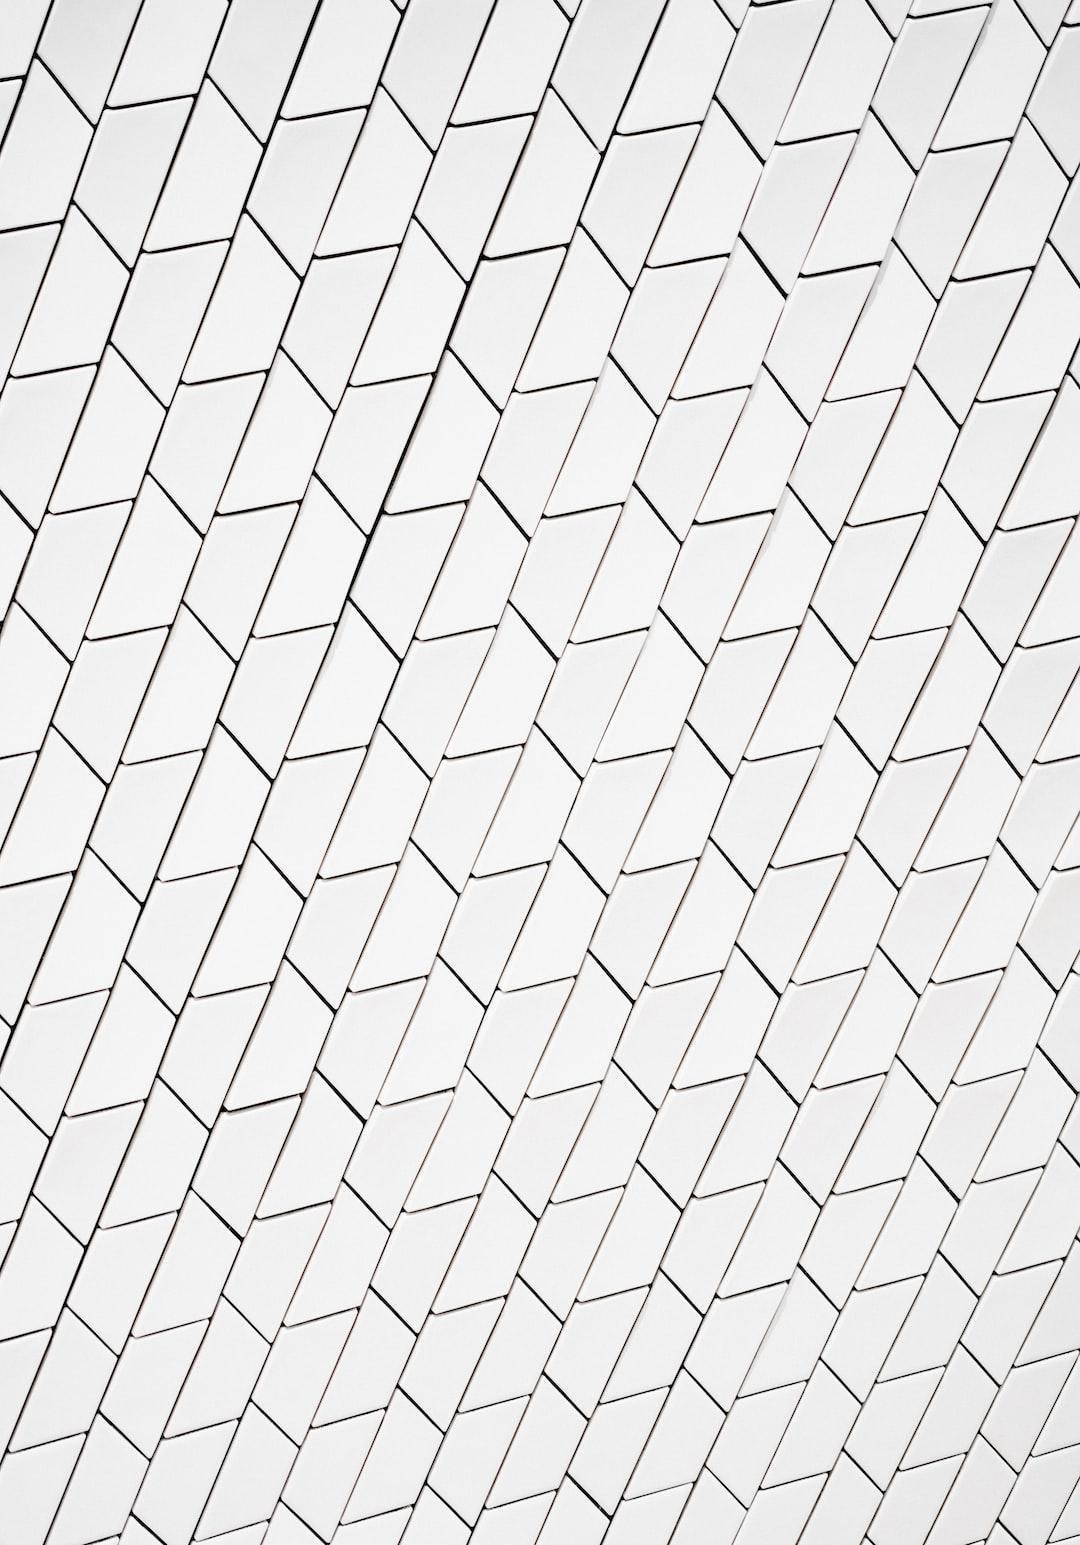 Portrait orientation white tiled background